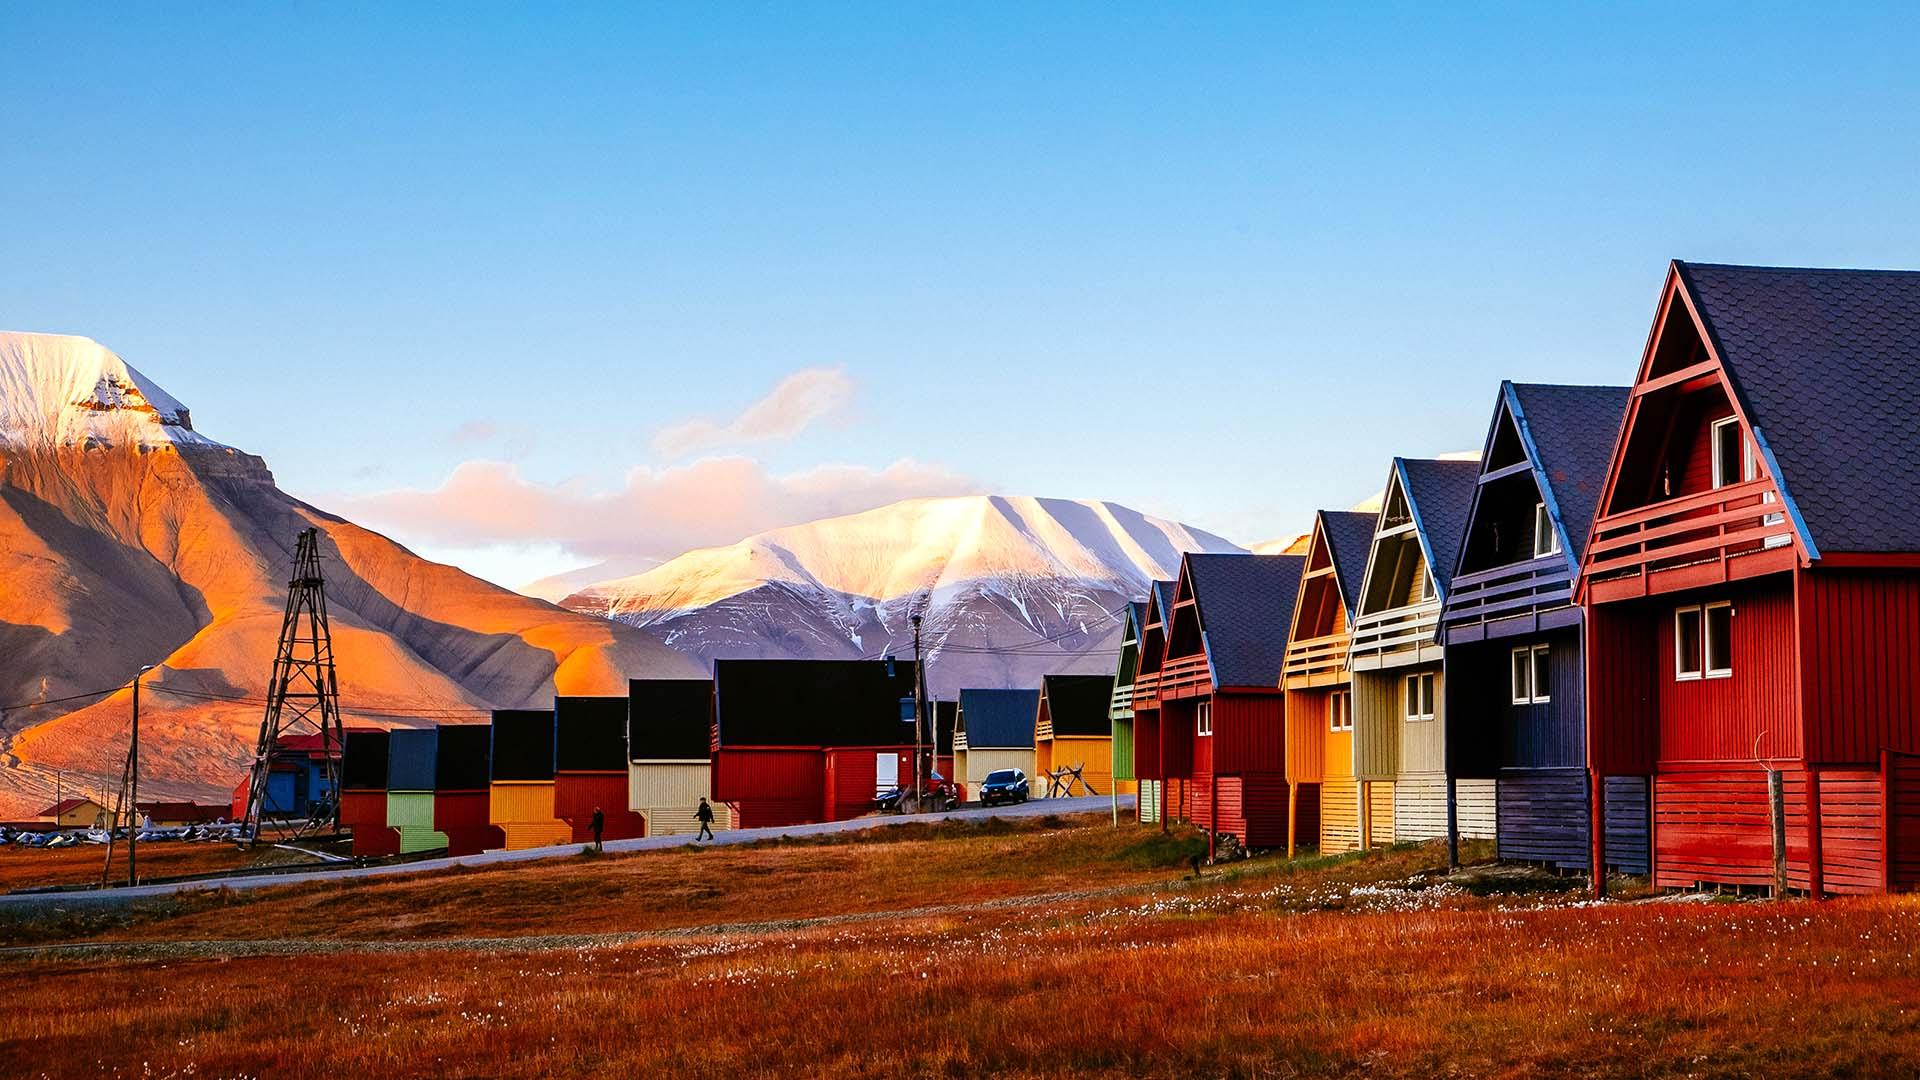 Best of Svalbard - Isfjord Radio & Huskies - 5 Days 4 Nights - Nordic  Visitor